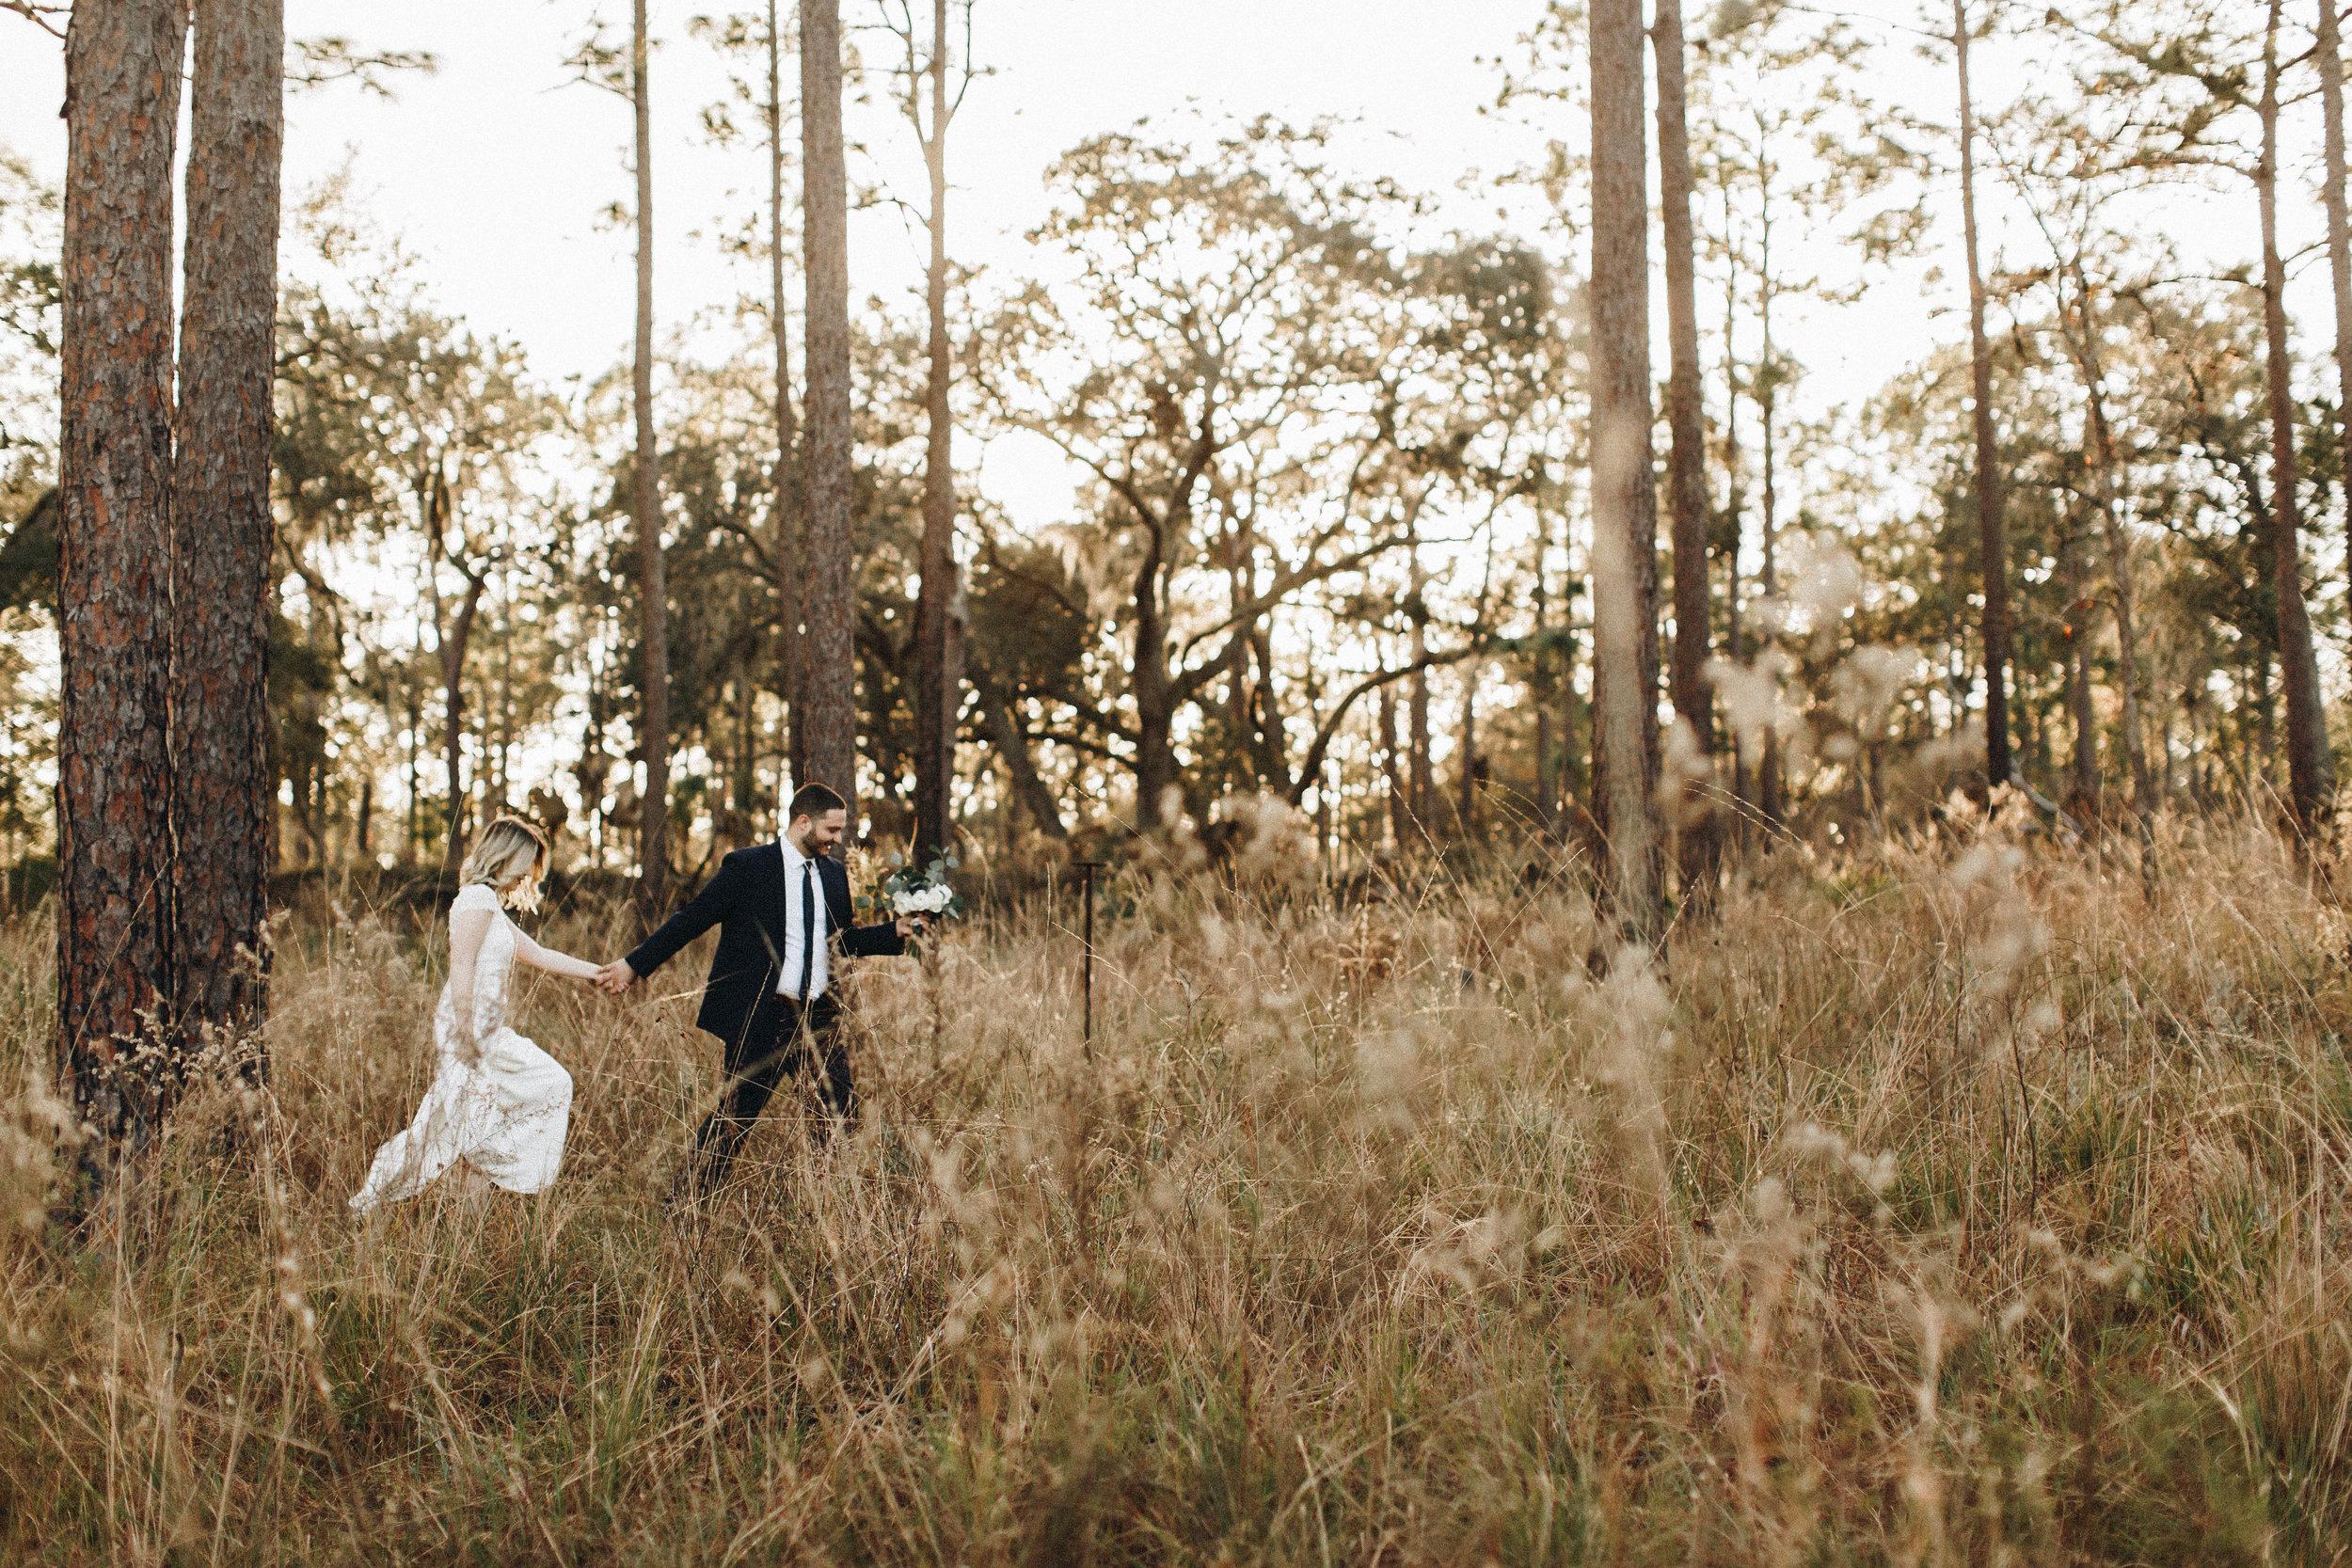 Orlando+wedding+photographer-16.jpeg